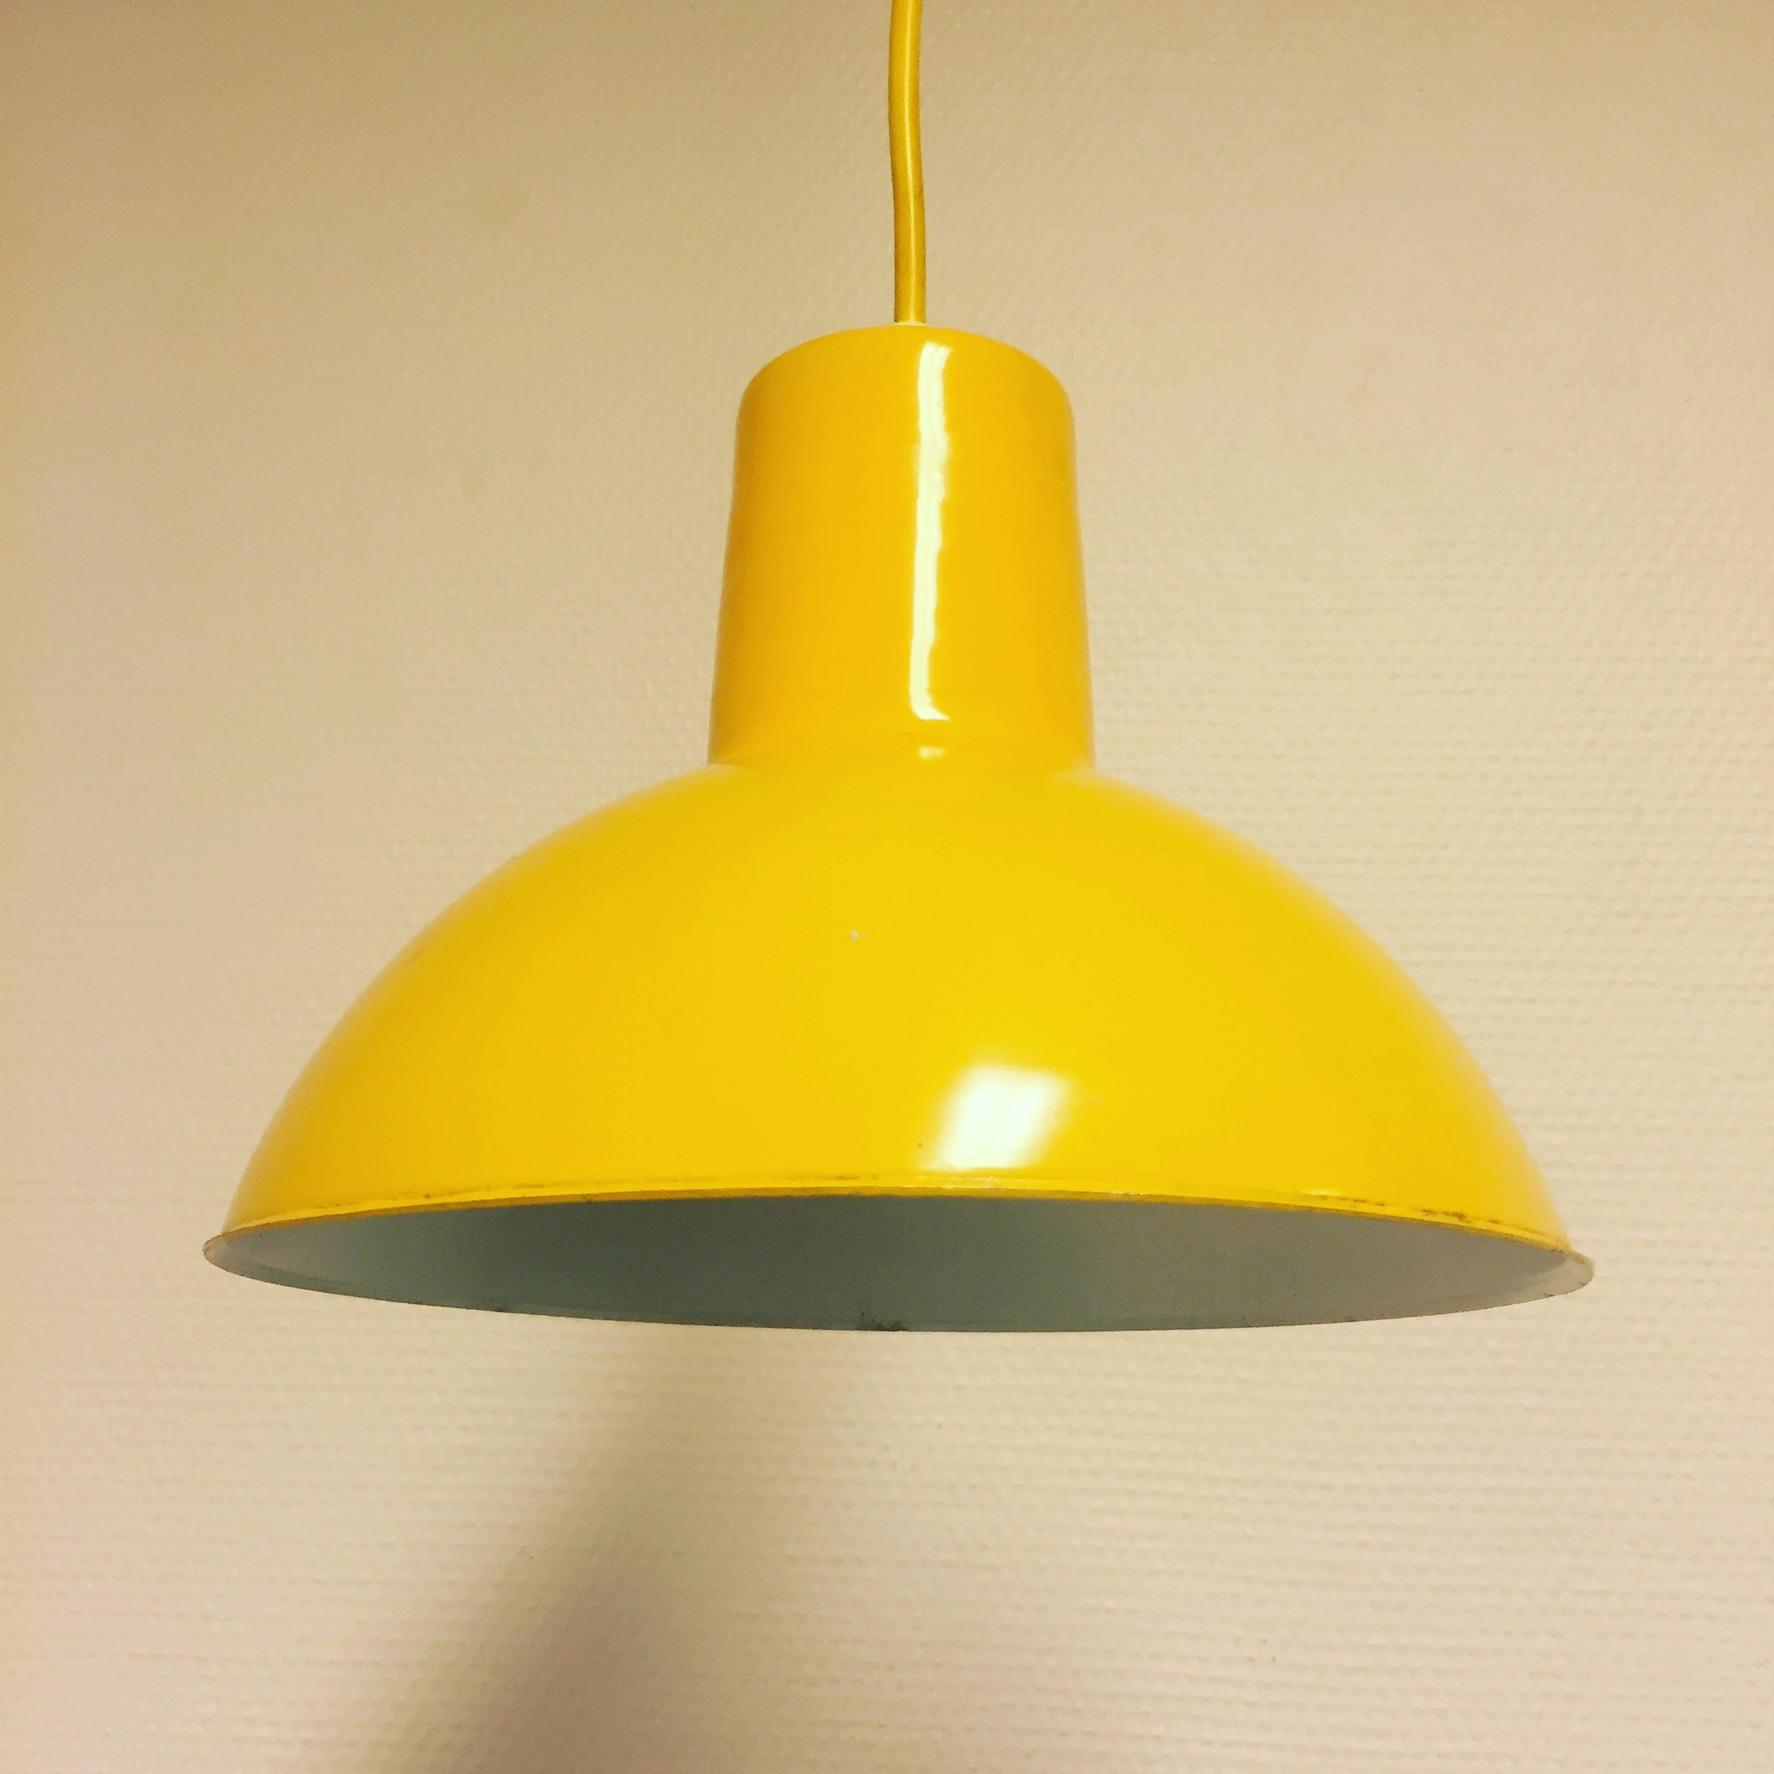 Omi Standerlampe